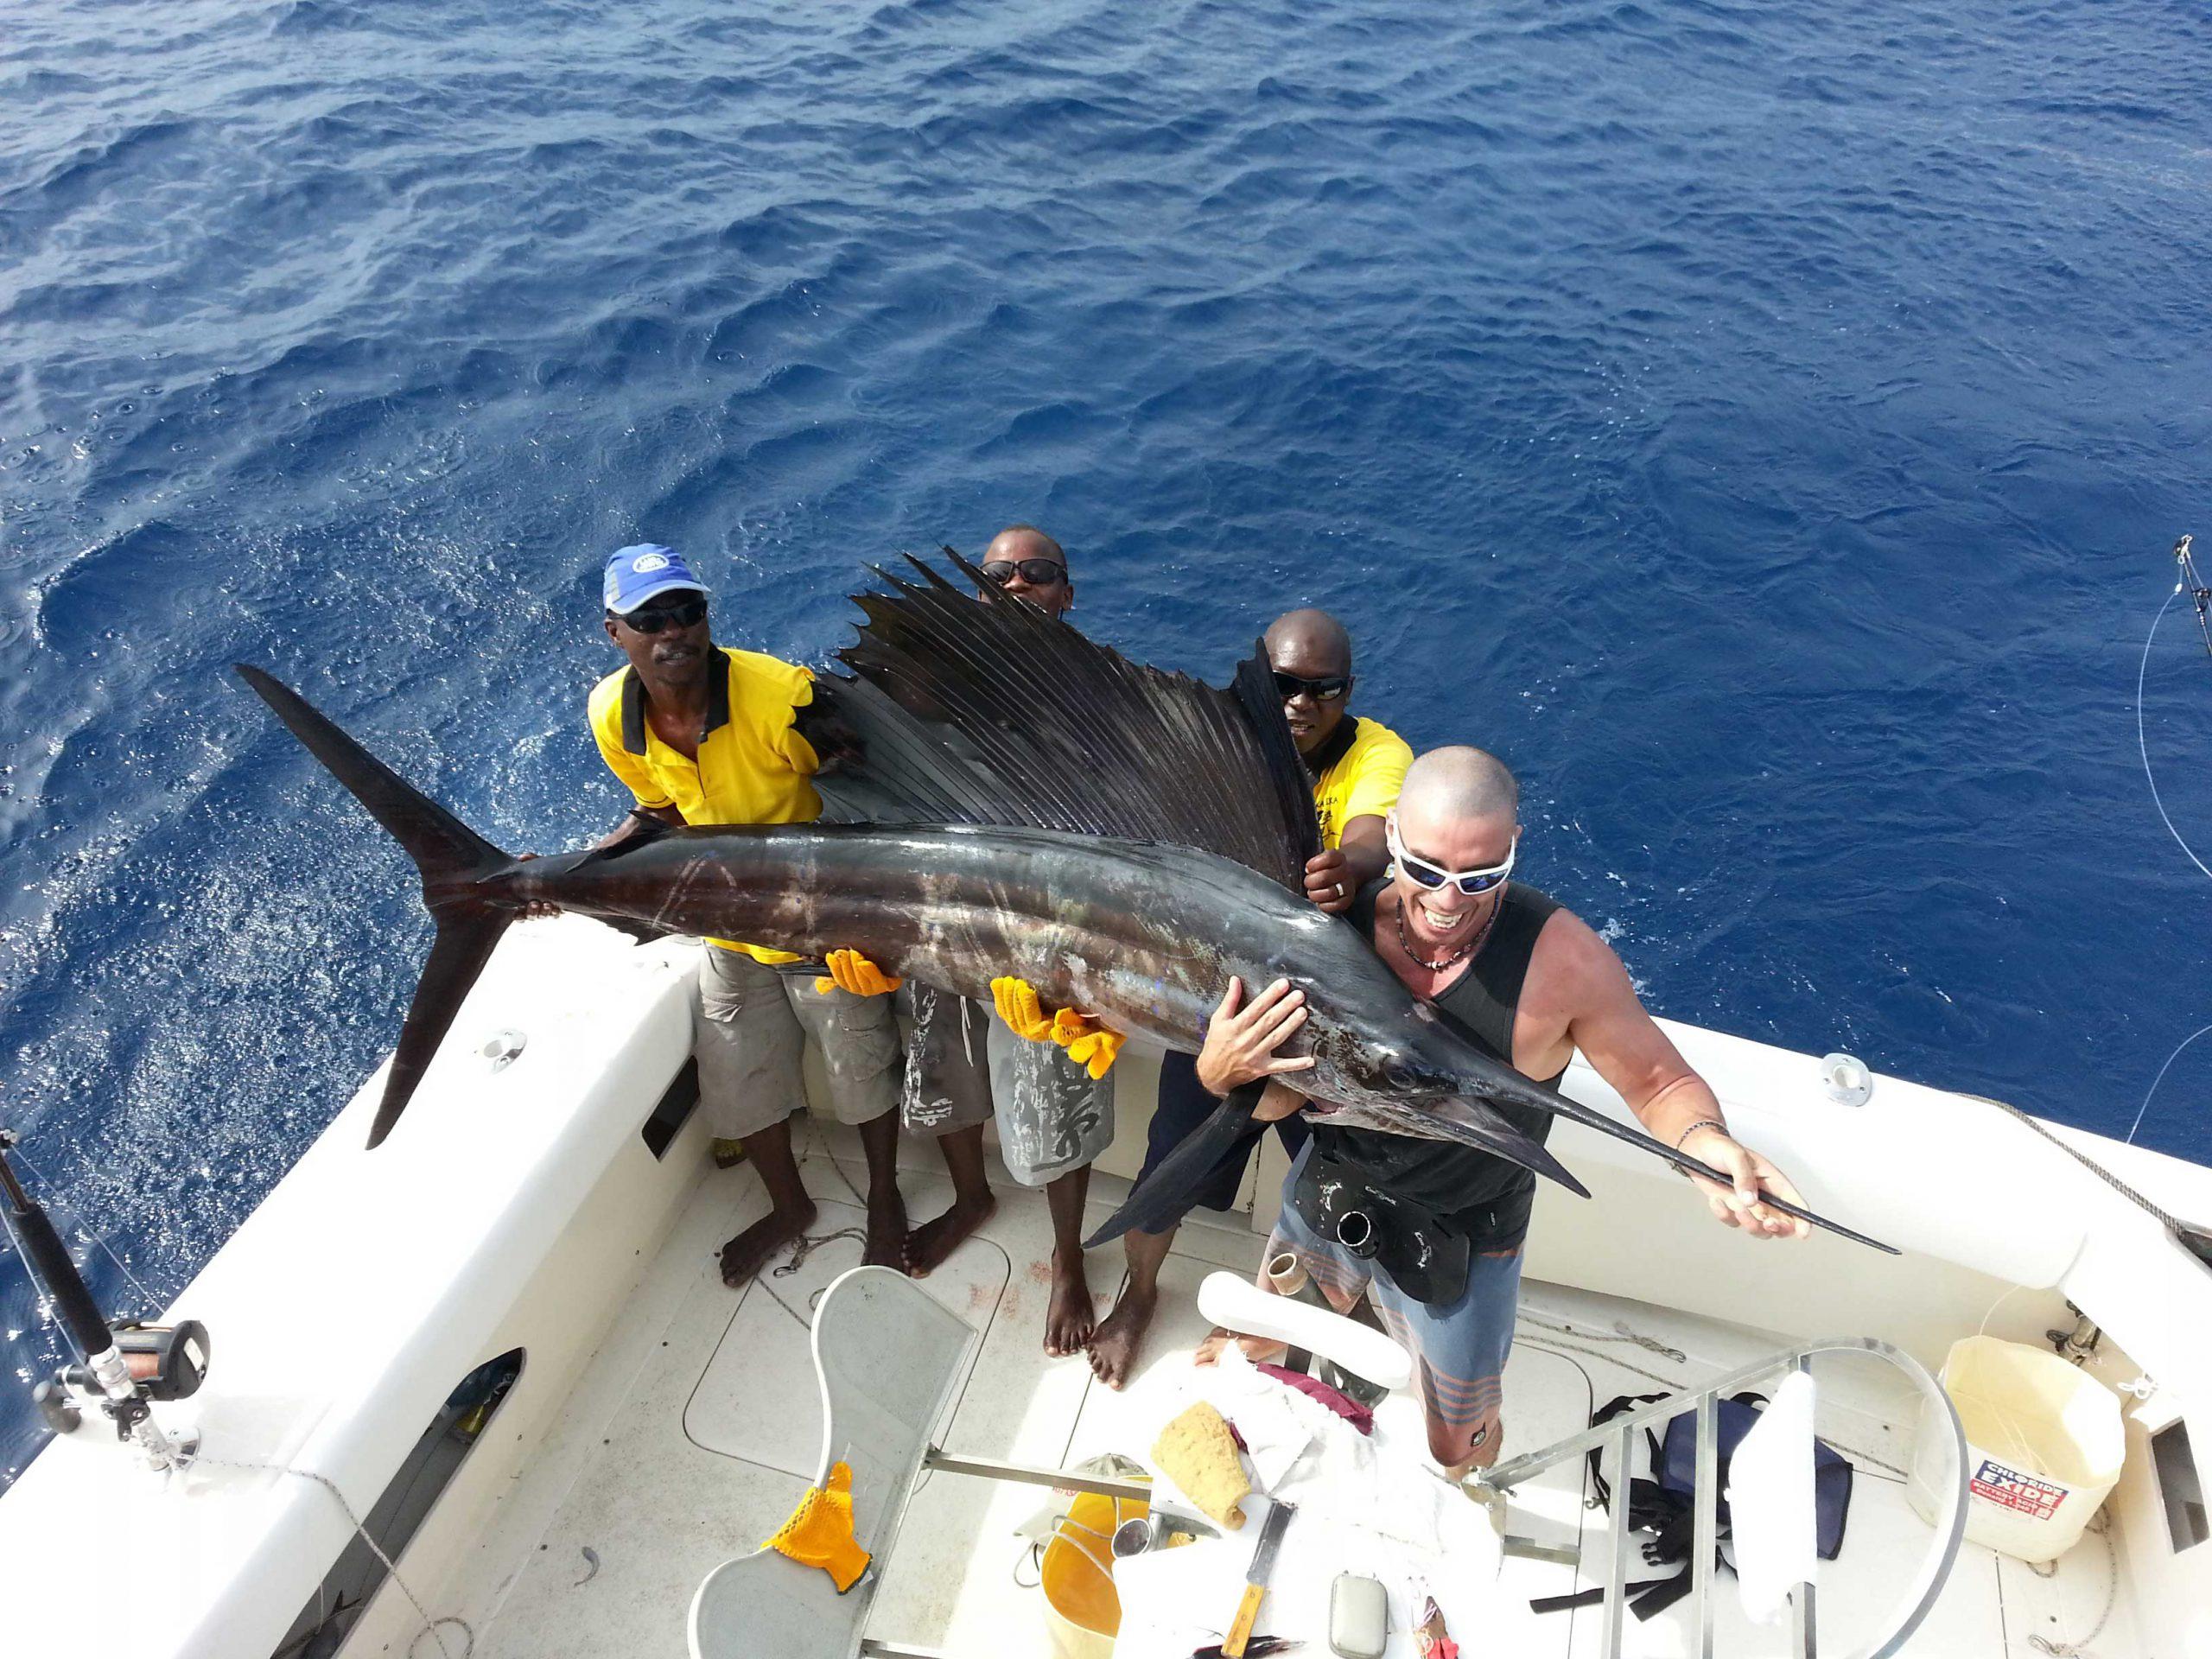 Big game fishing cacth in Kenya- Sailfish